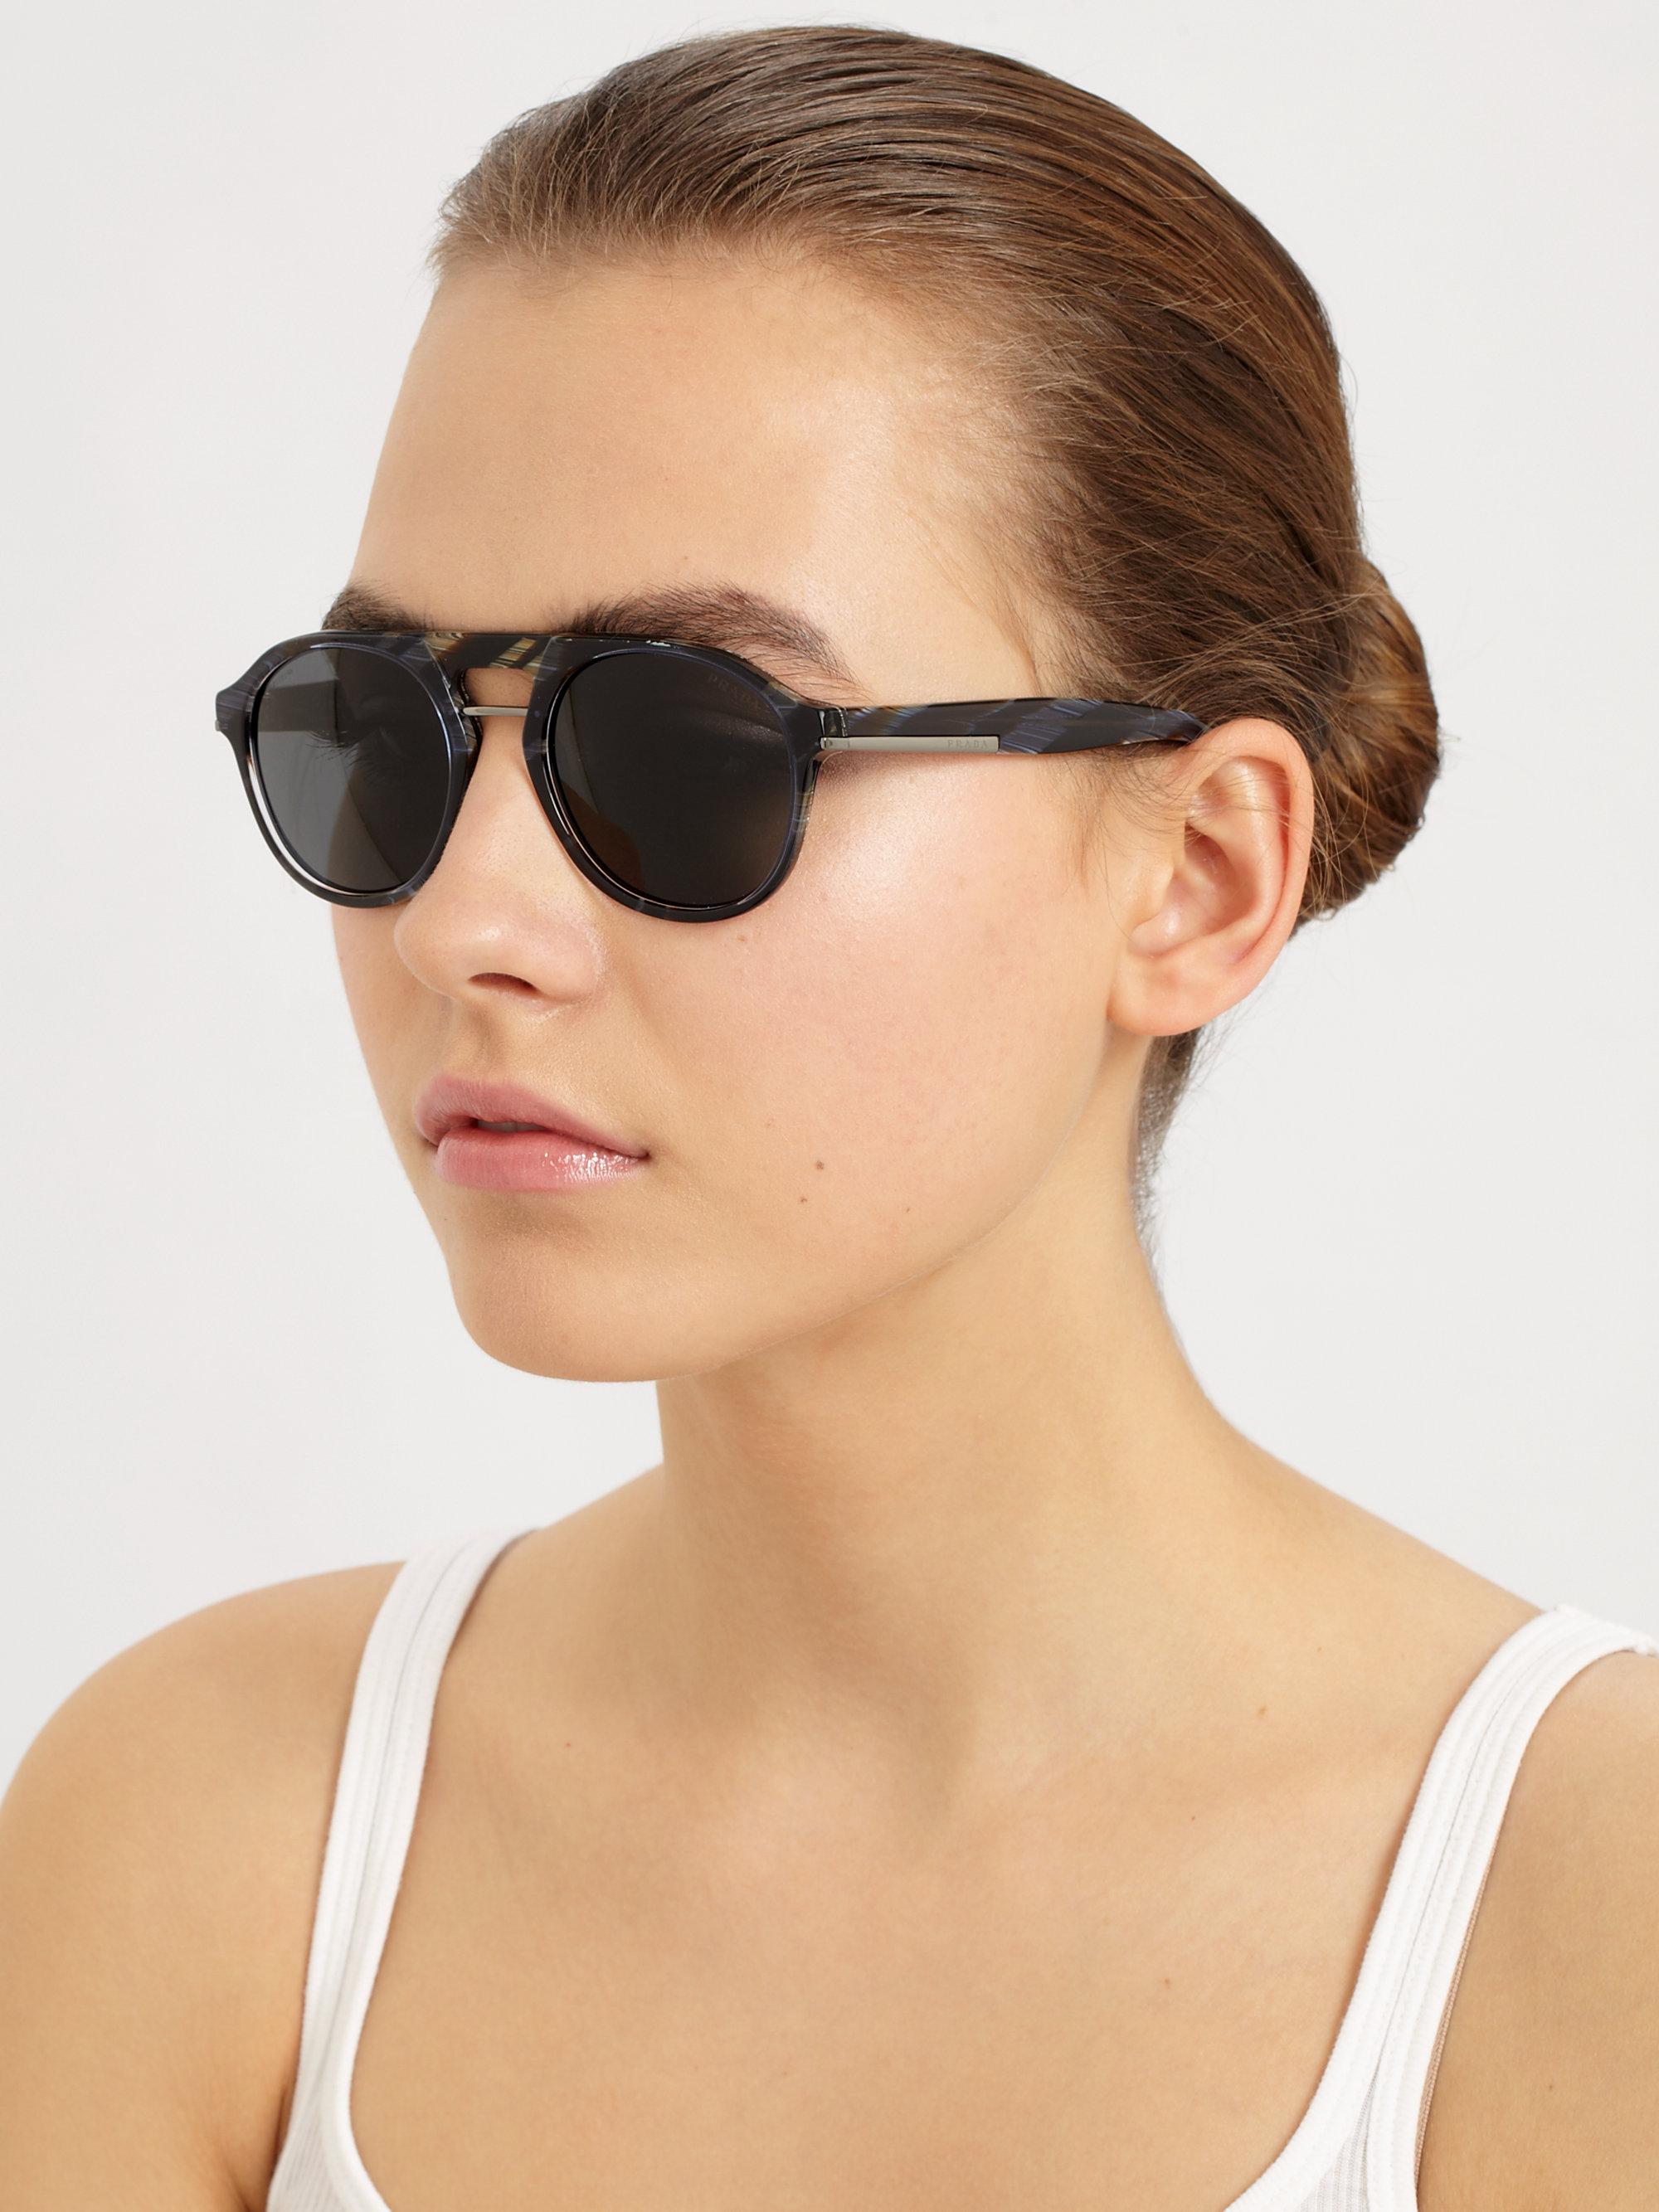 b152183f331 ... australia lyst prada flat top round acetate sunglasses in black 31dea  dc755